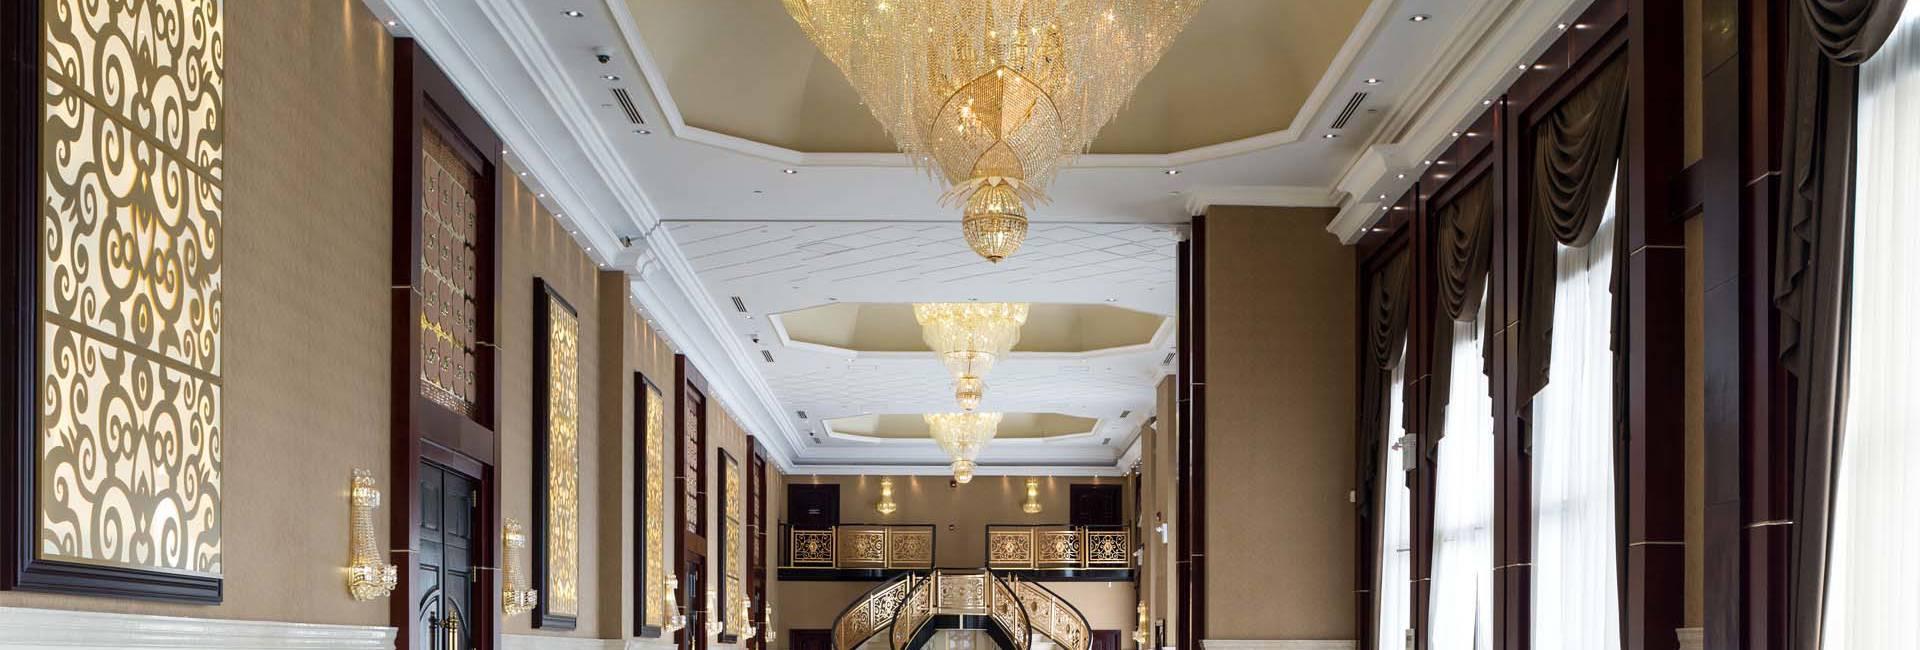 banquet halls in toronto